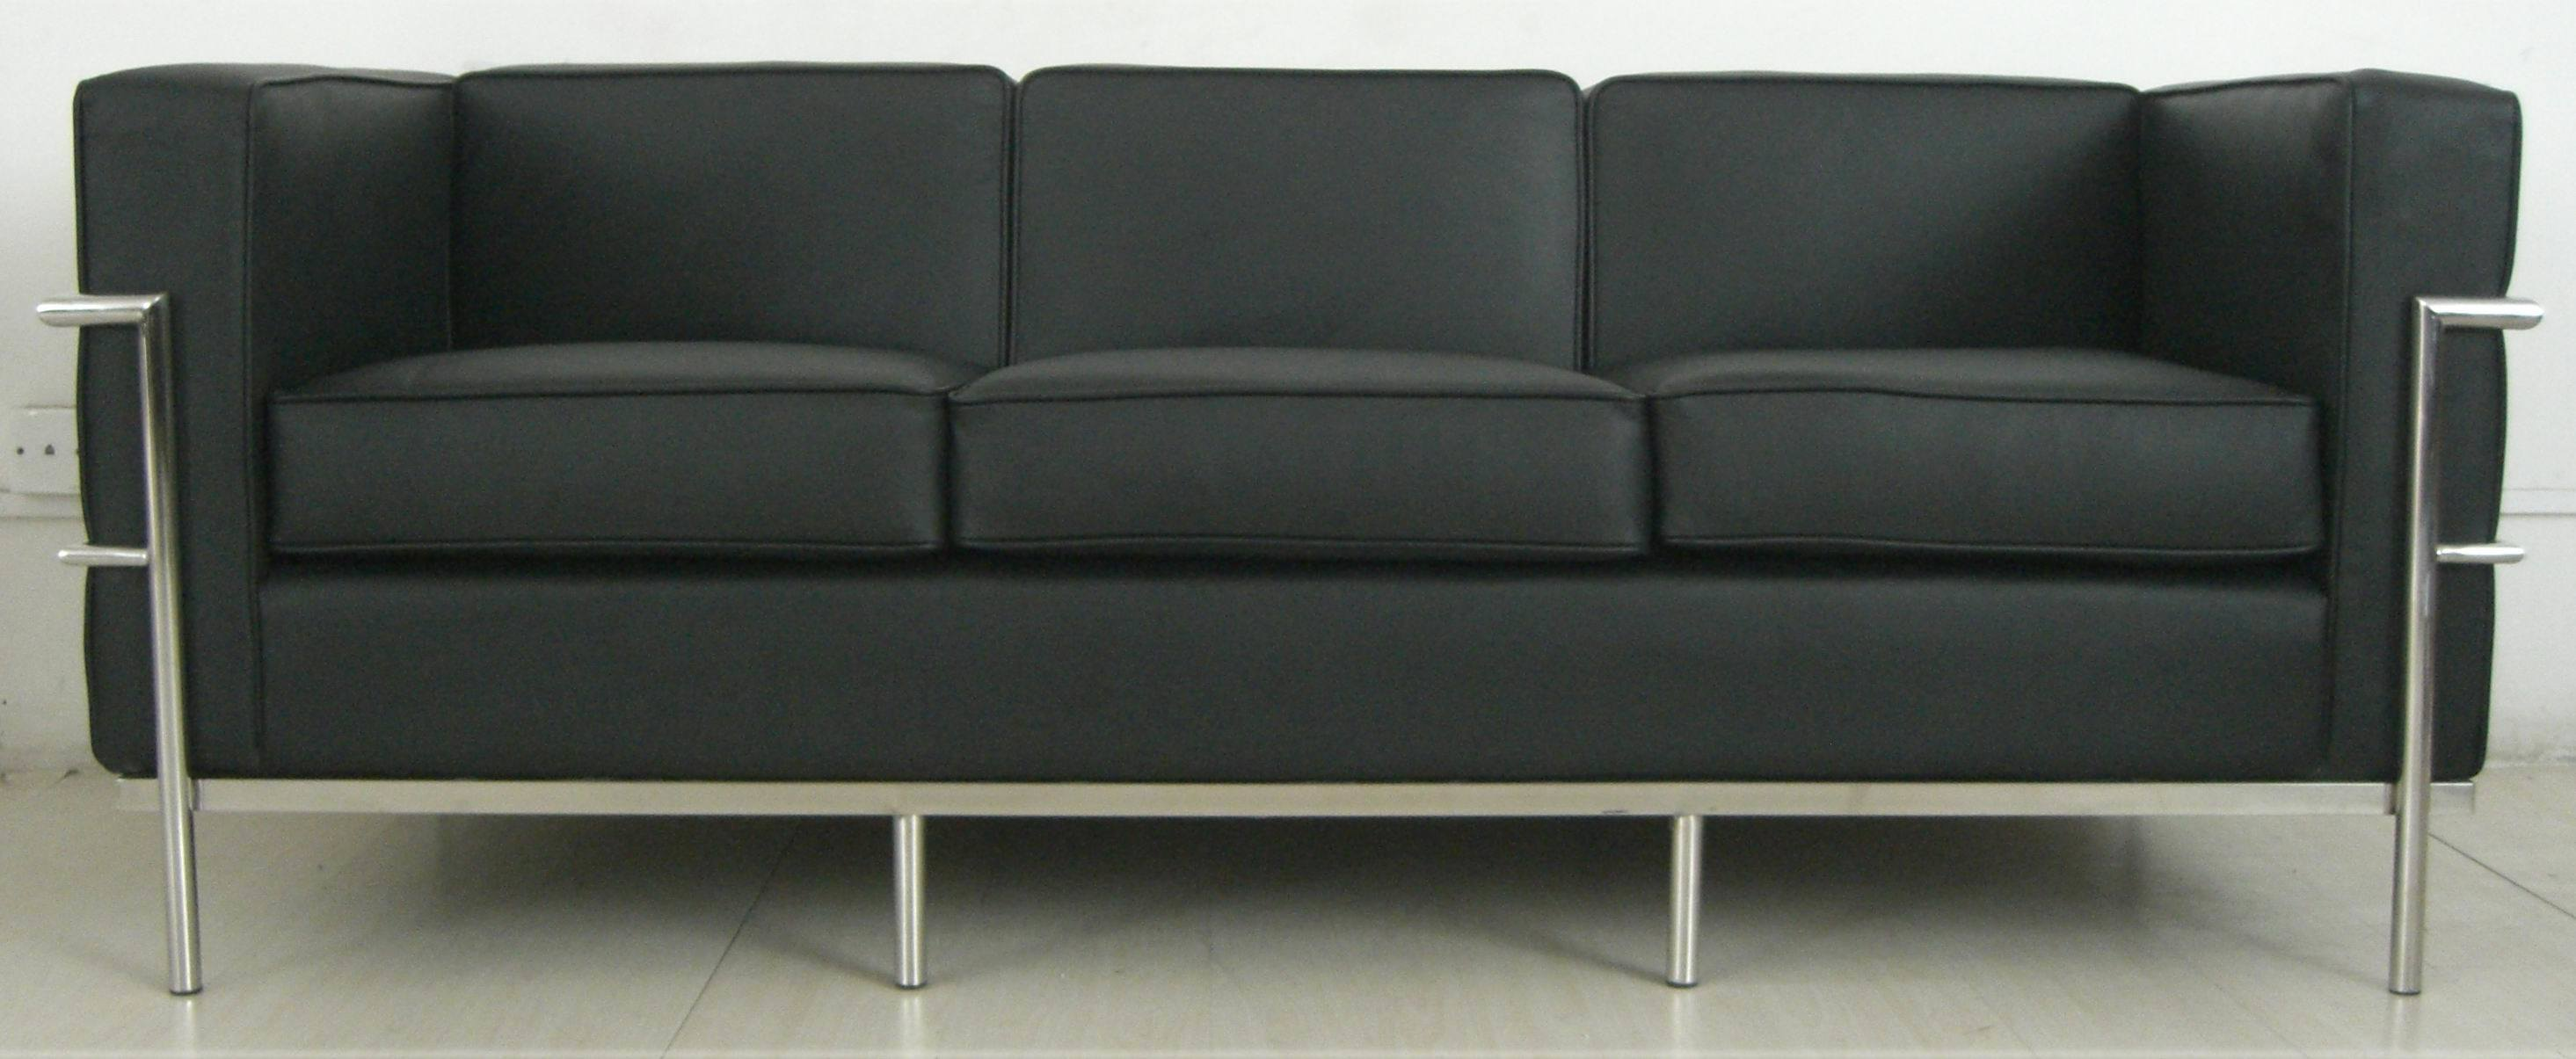 sofa company nl slavia prague usti nad labem sofascore de bank van het leer le corbusier lc2